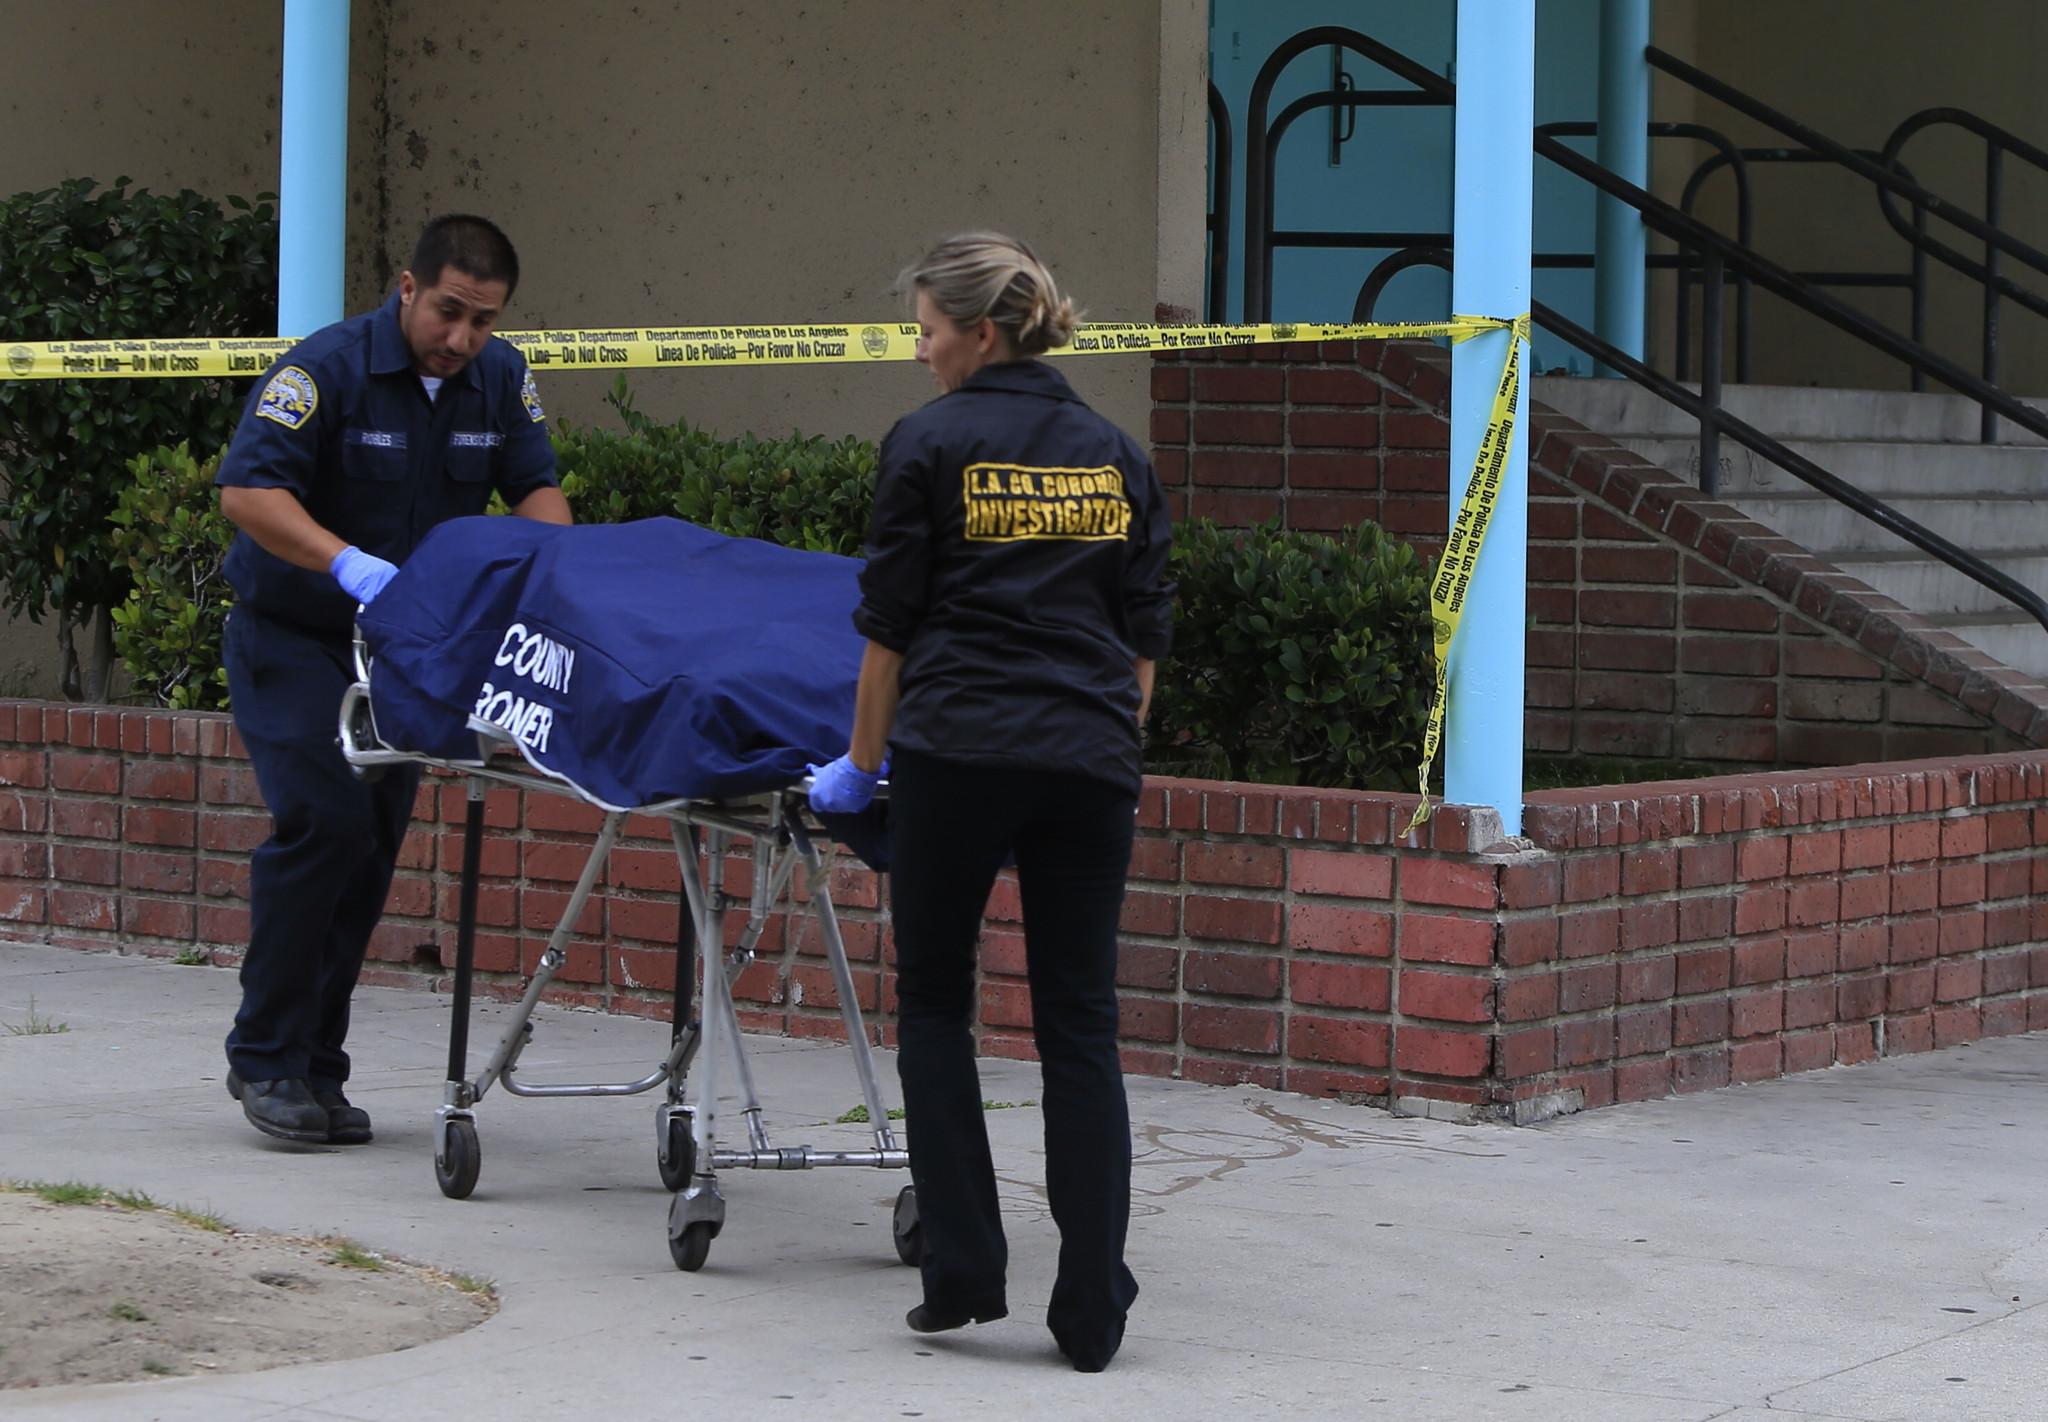 Man's body found near Markham Middle School in Watts - Los